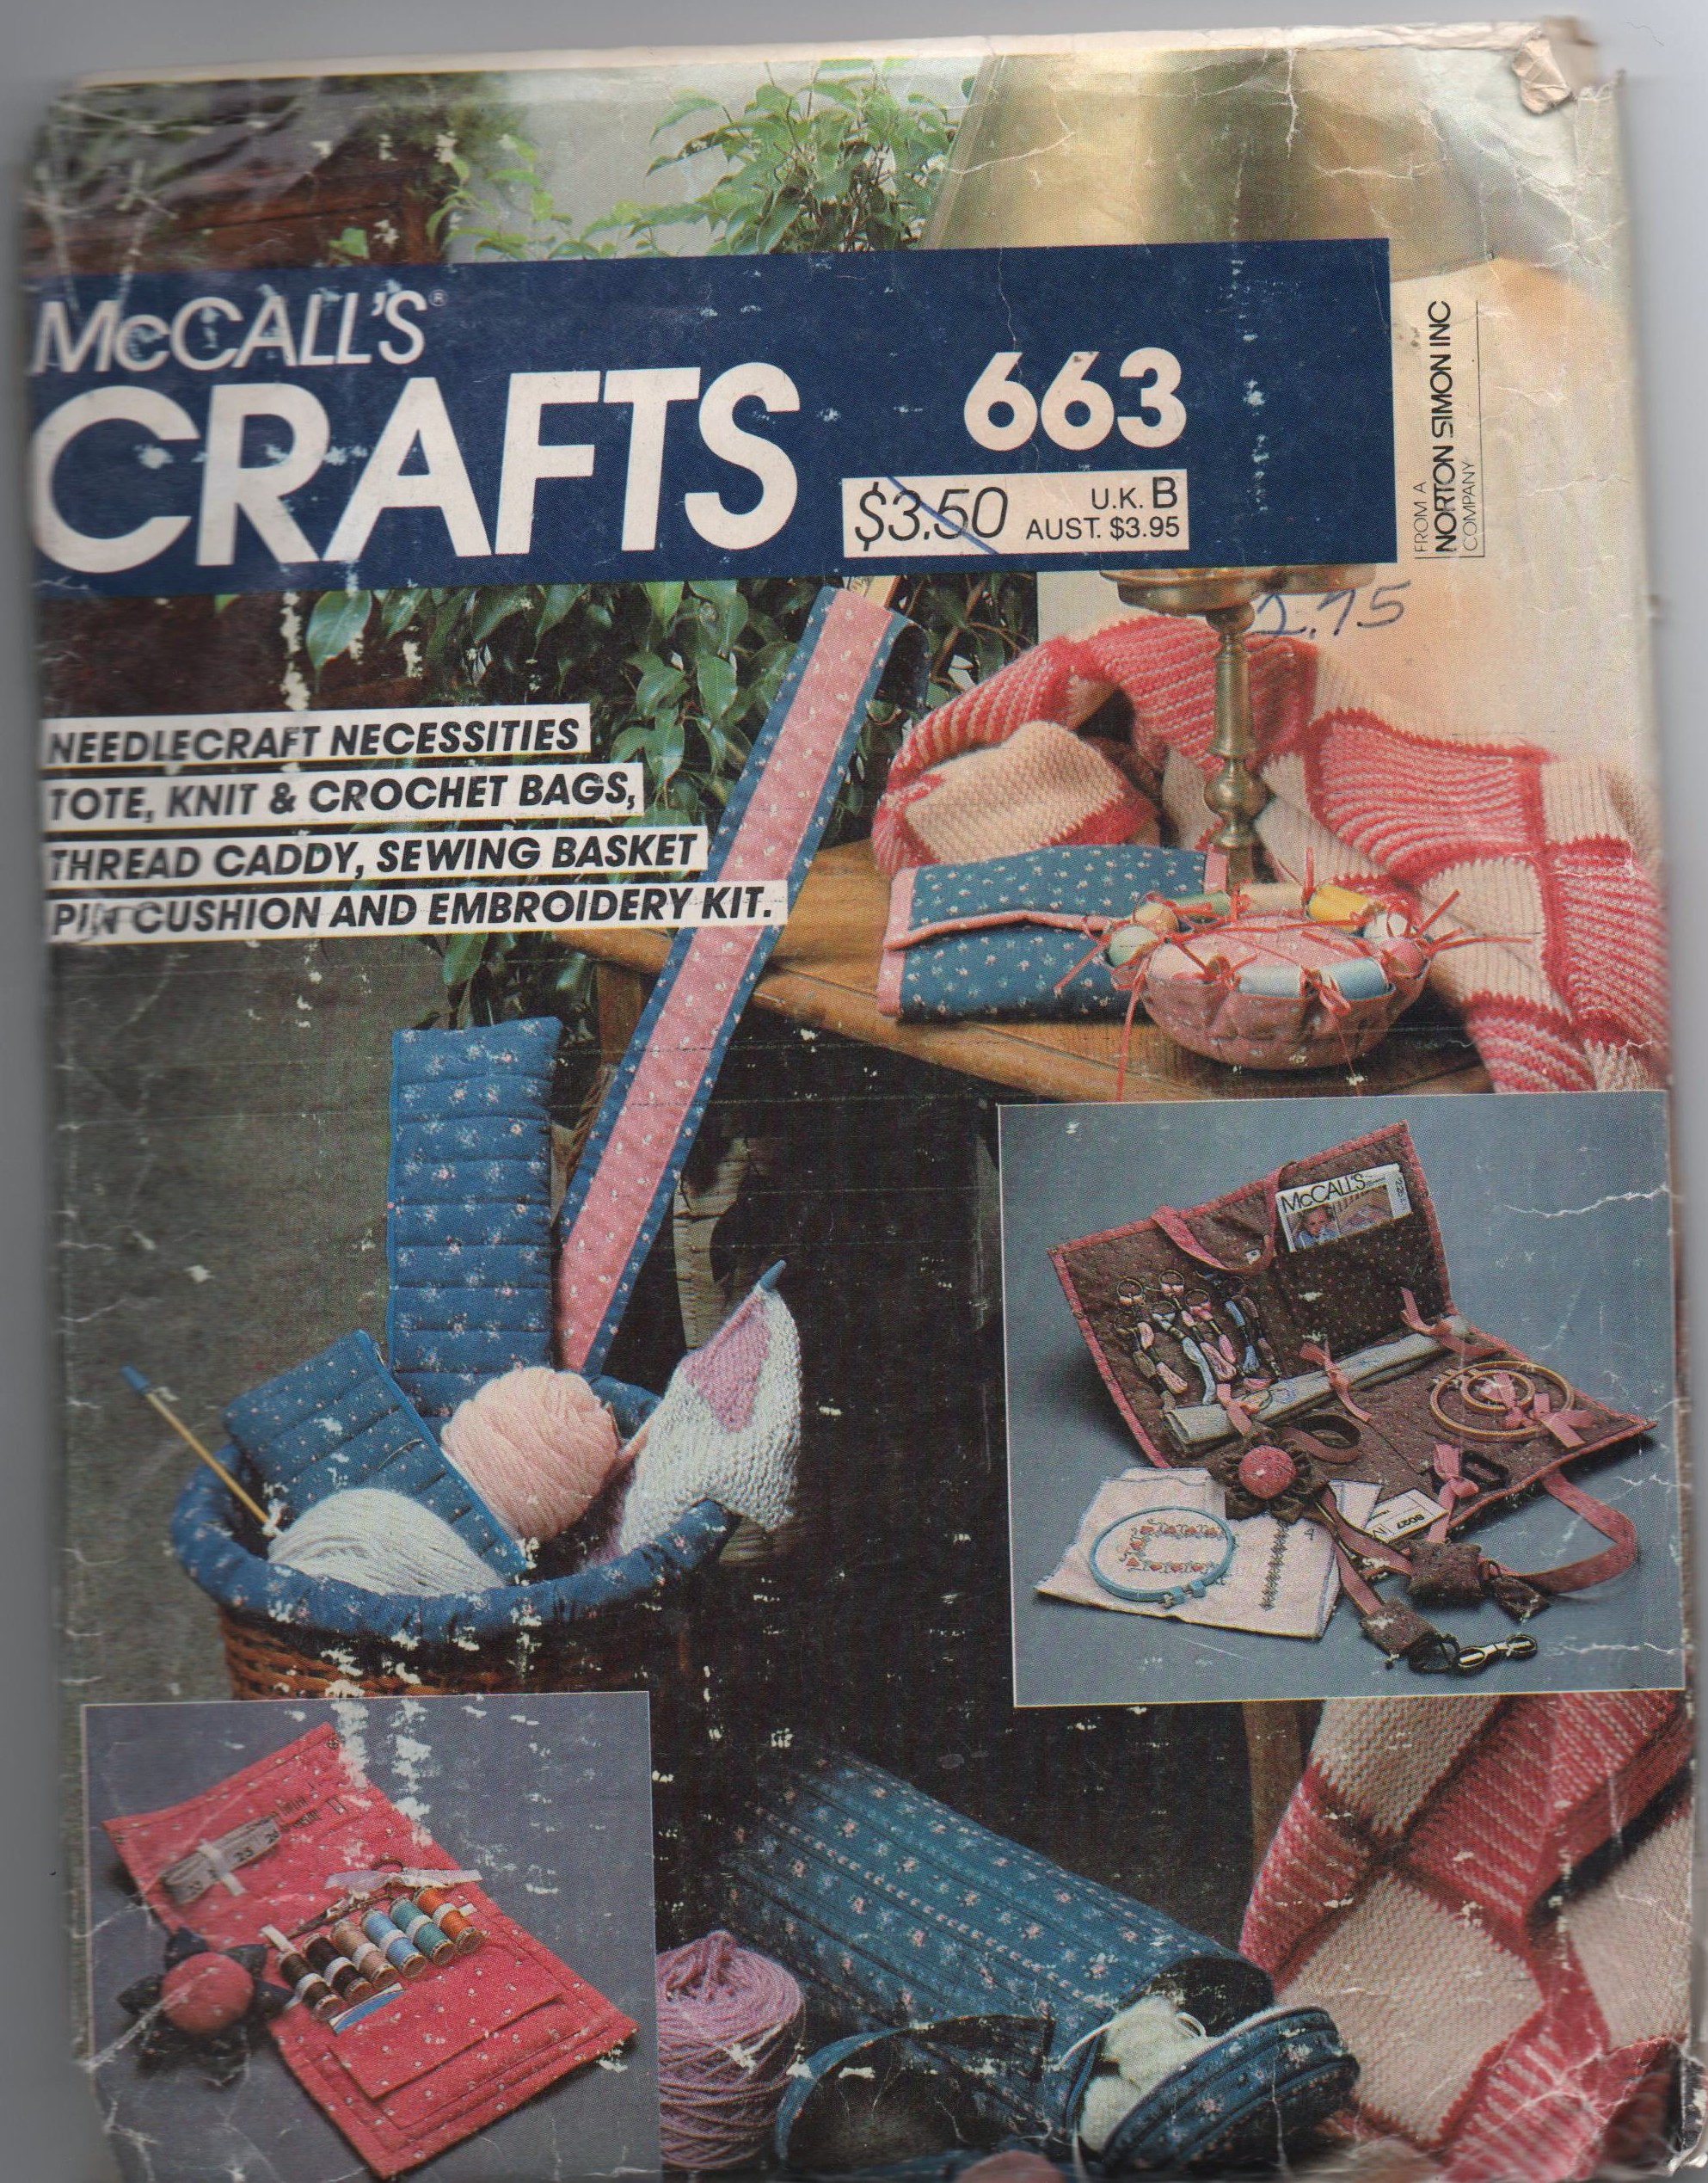 McCall's 663